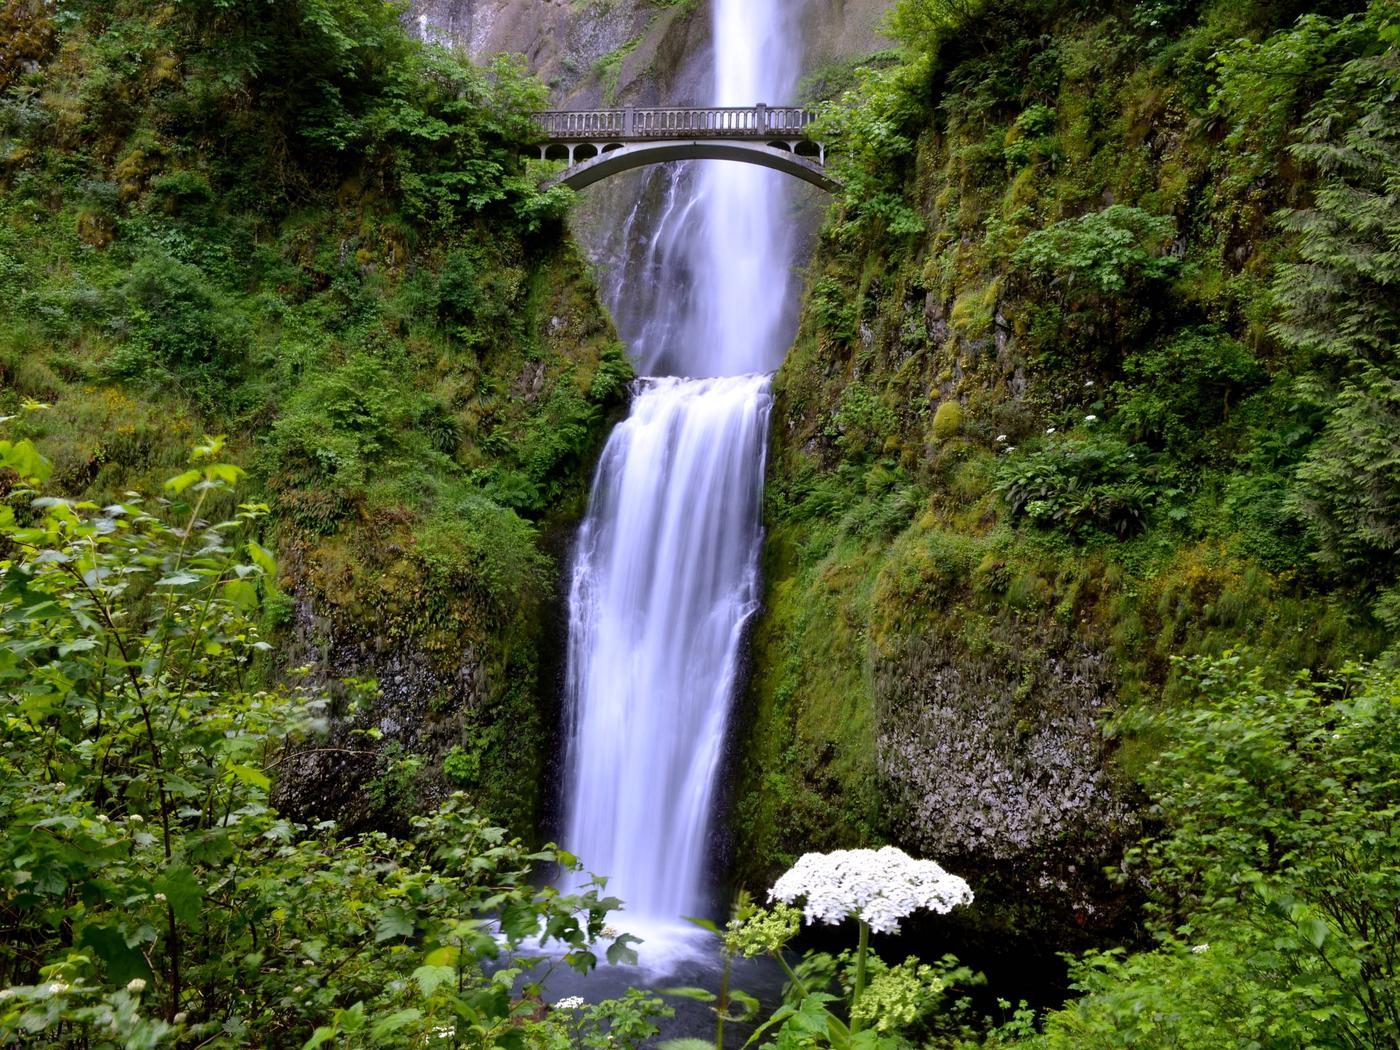 Multnomah Falls in the Columbia Gorge Scenic AreaImage of Multnomah Falls with a bridge